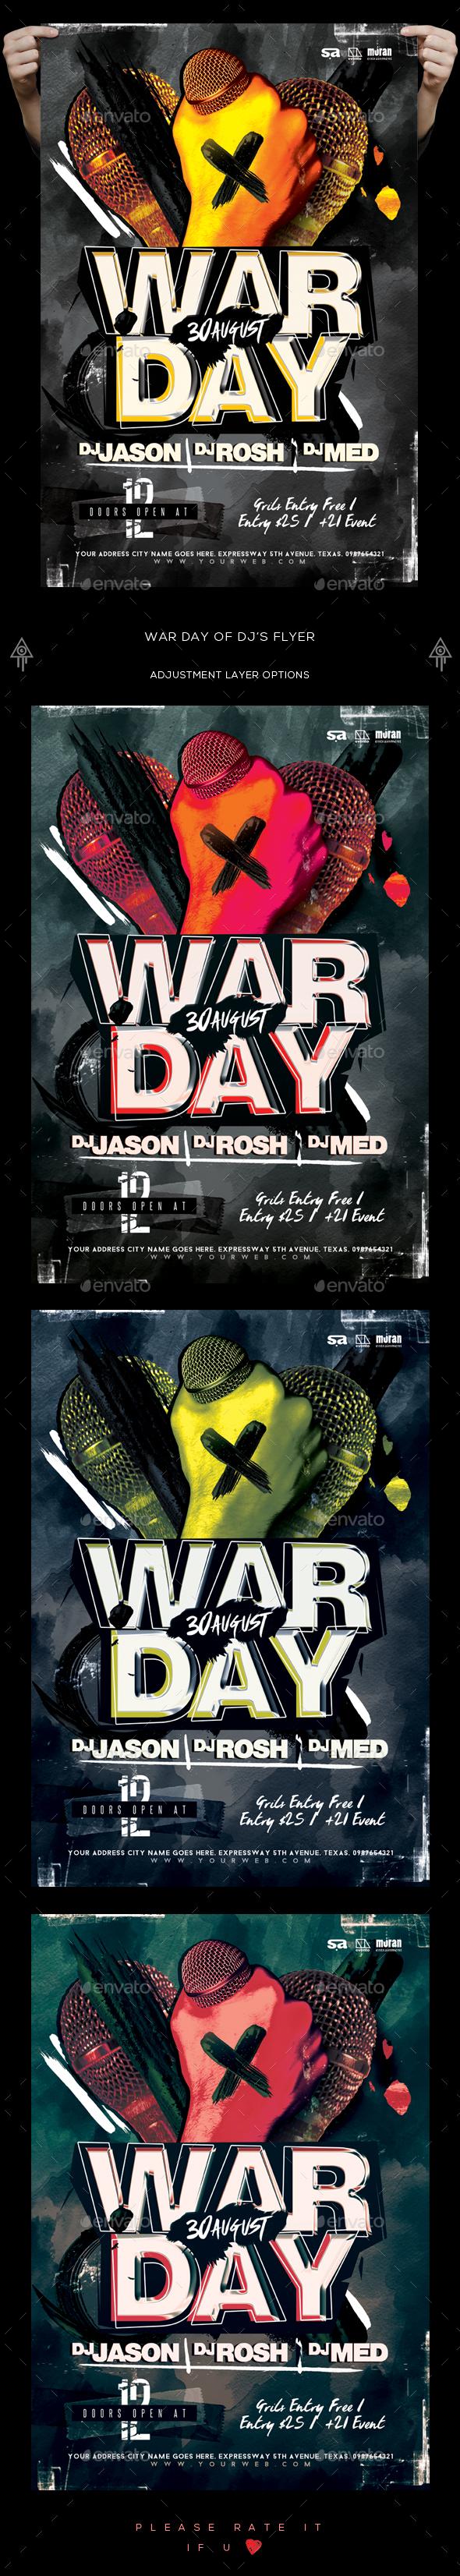 War Day Of DJs Flyer - Clubs & Parties Events